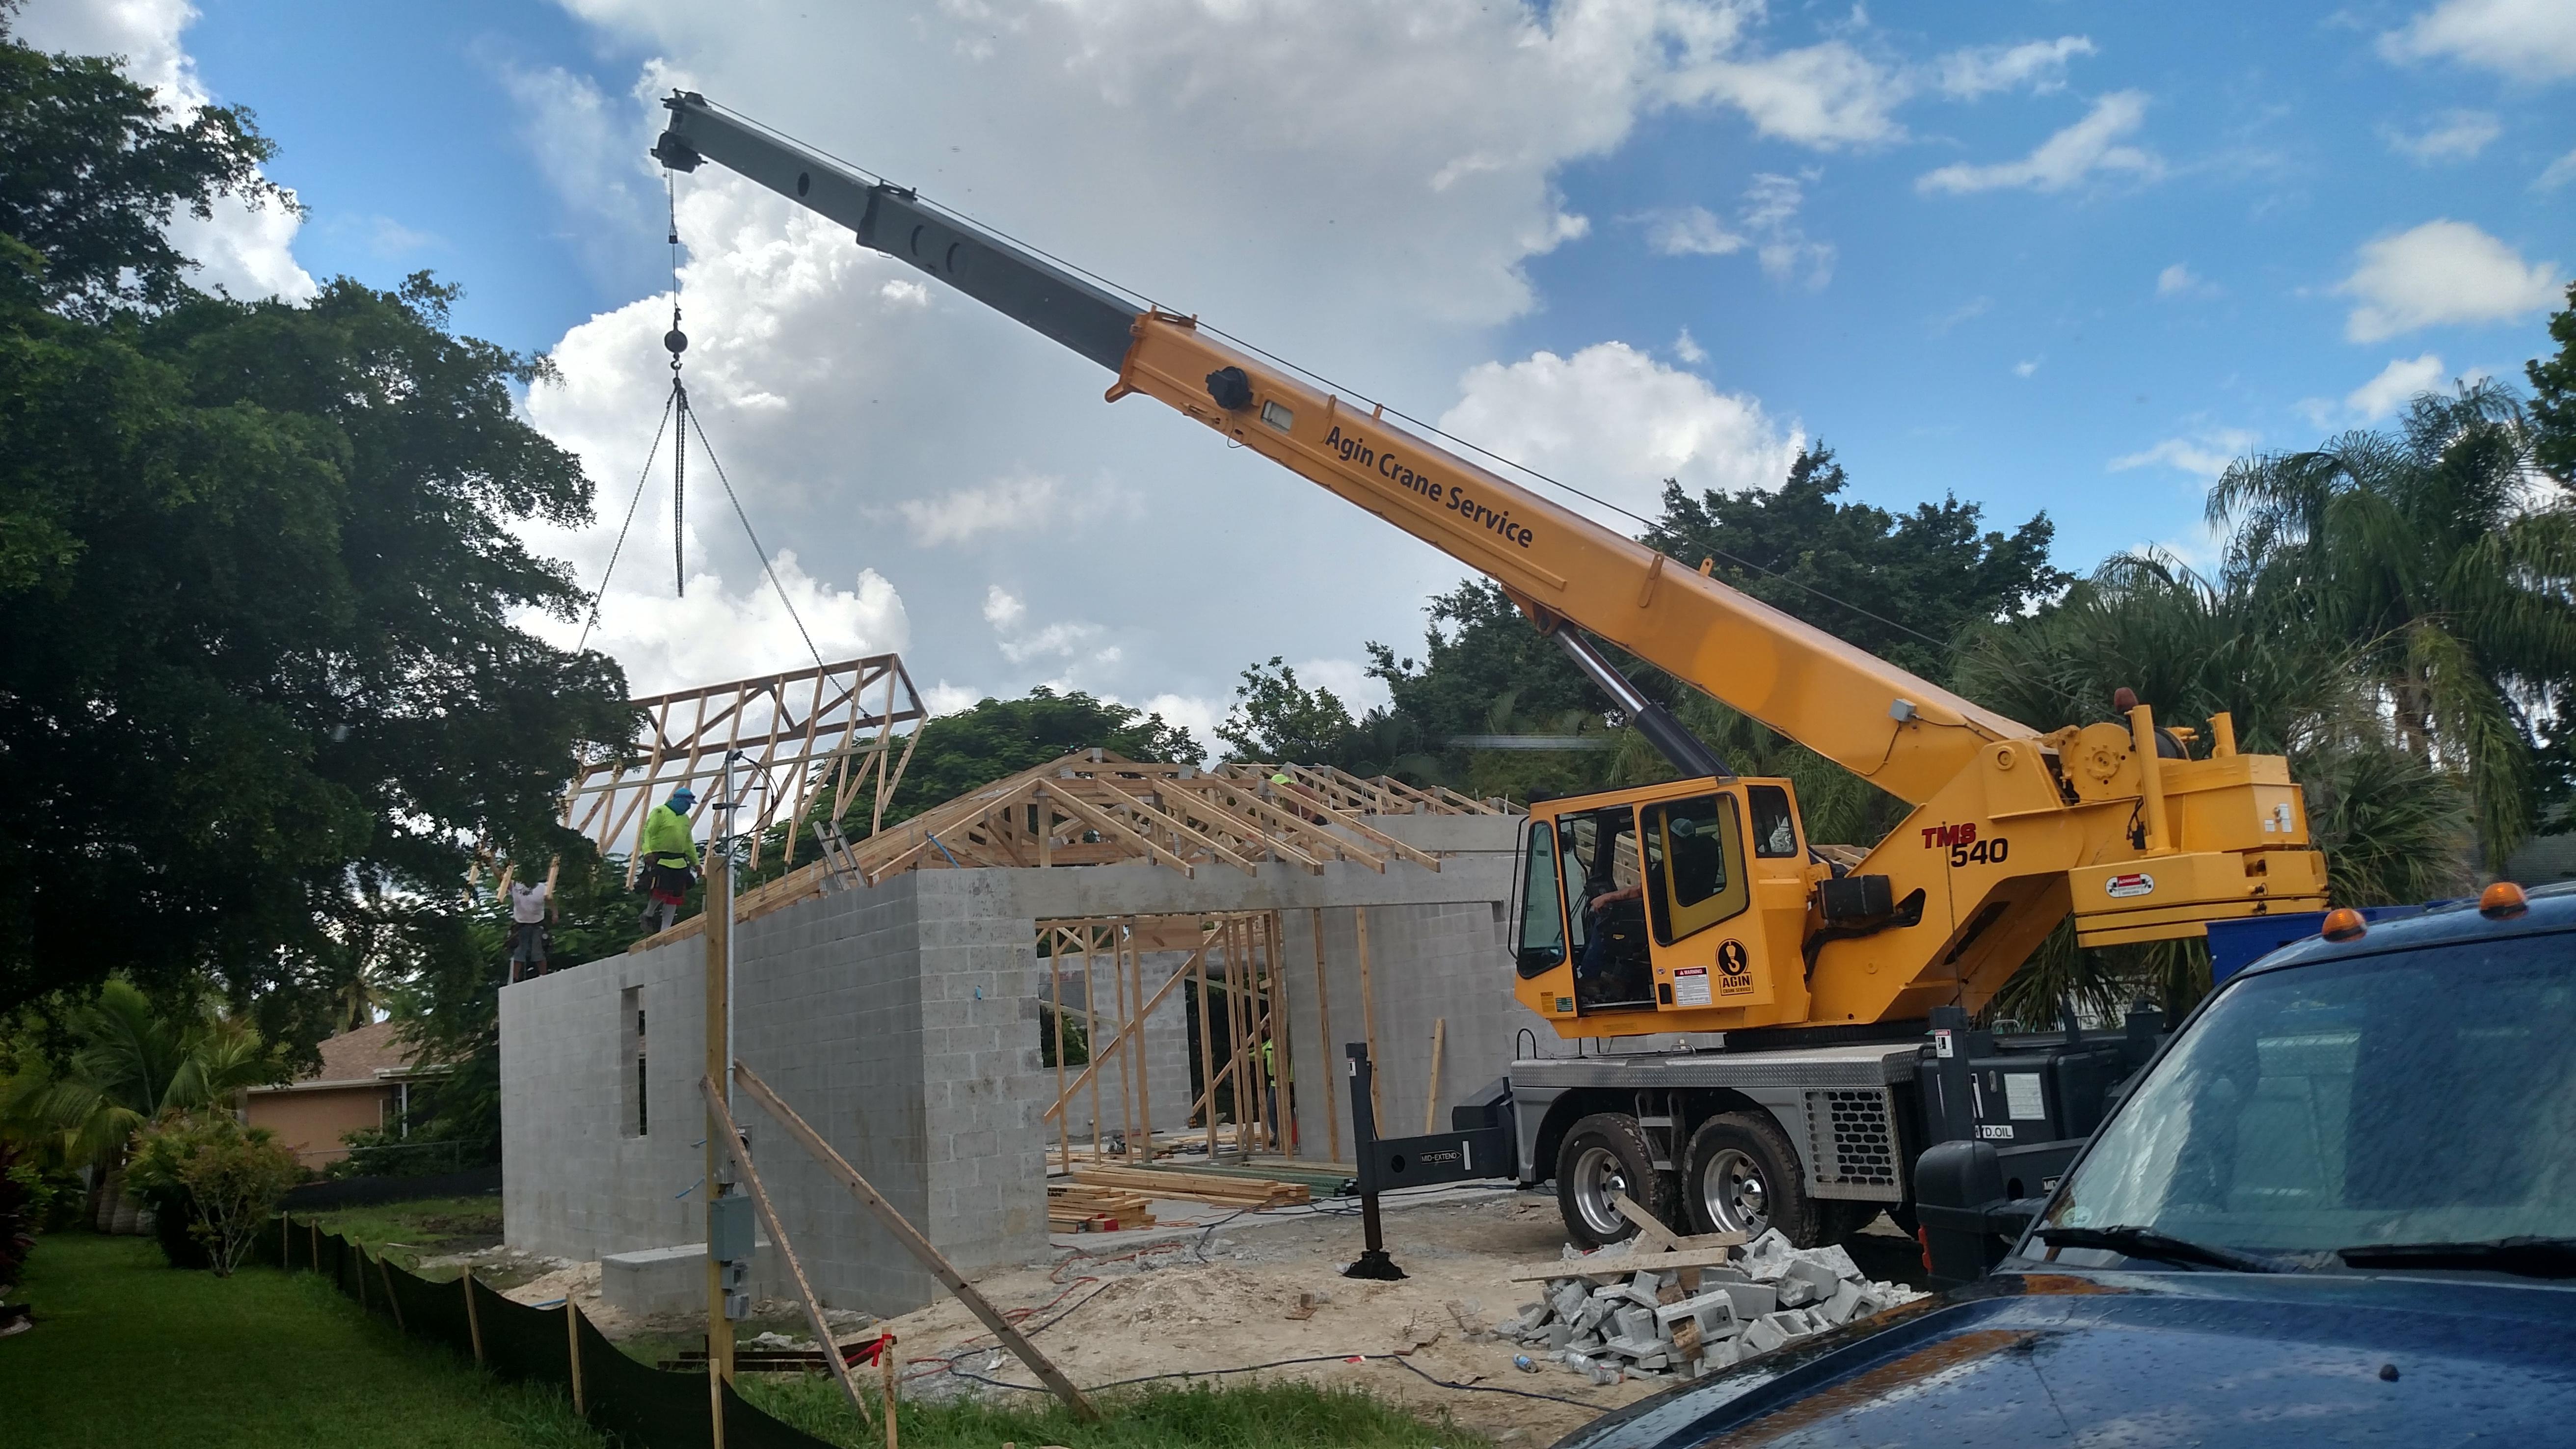 Agin Crane Service image 4